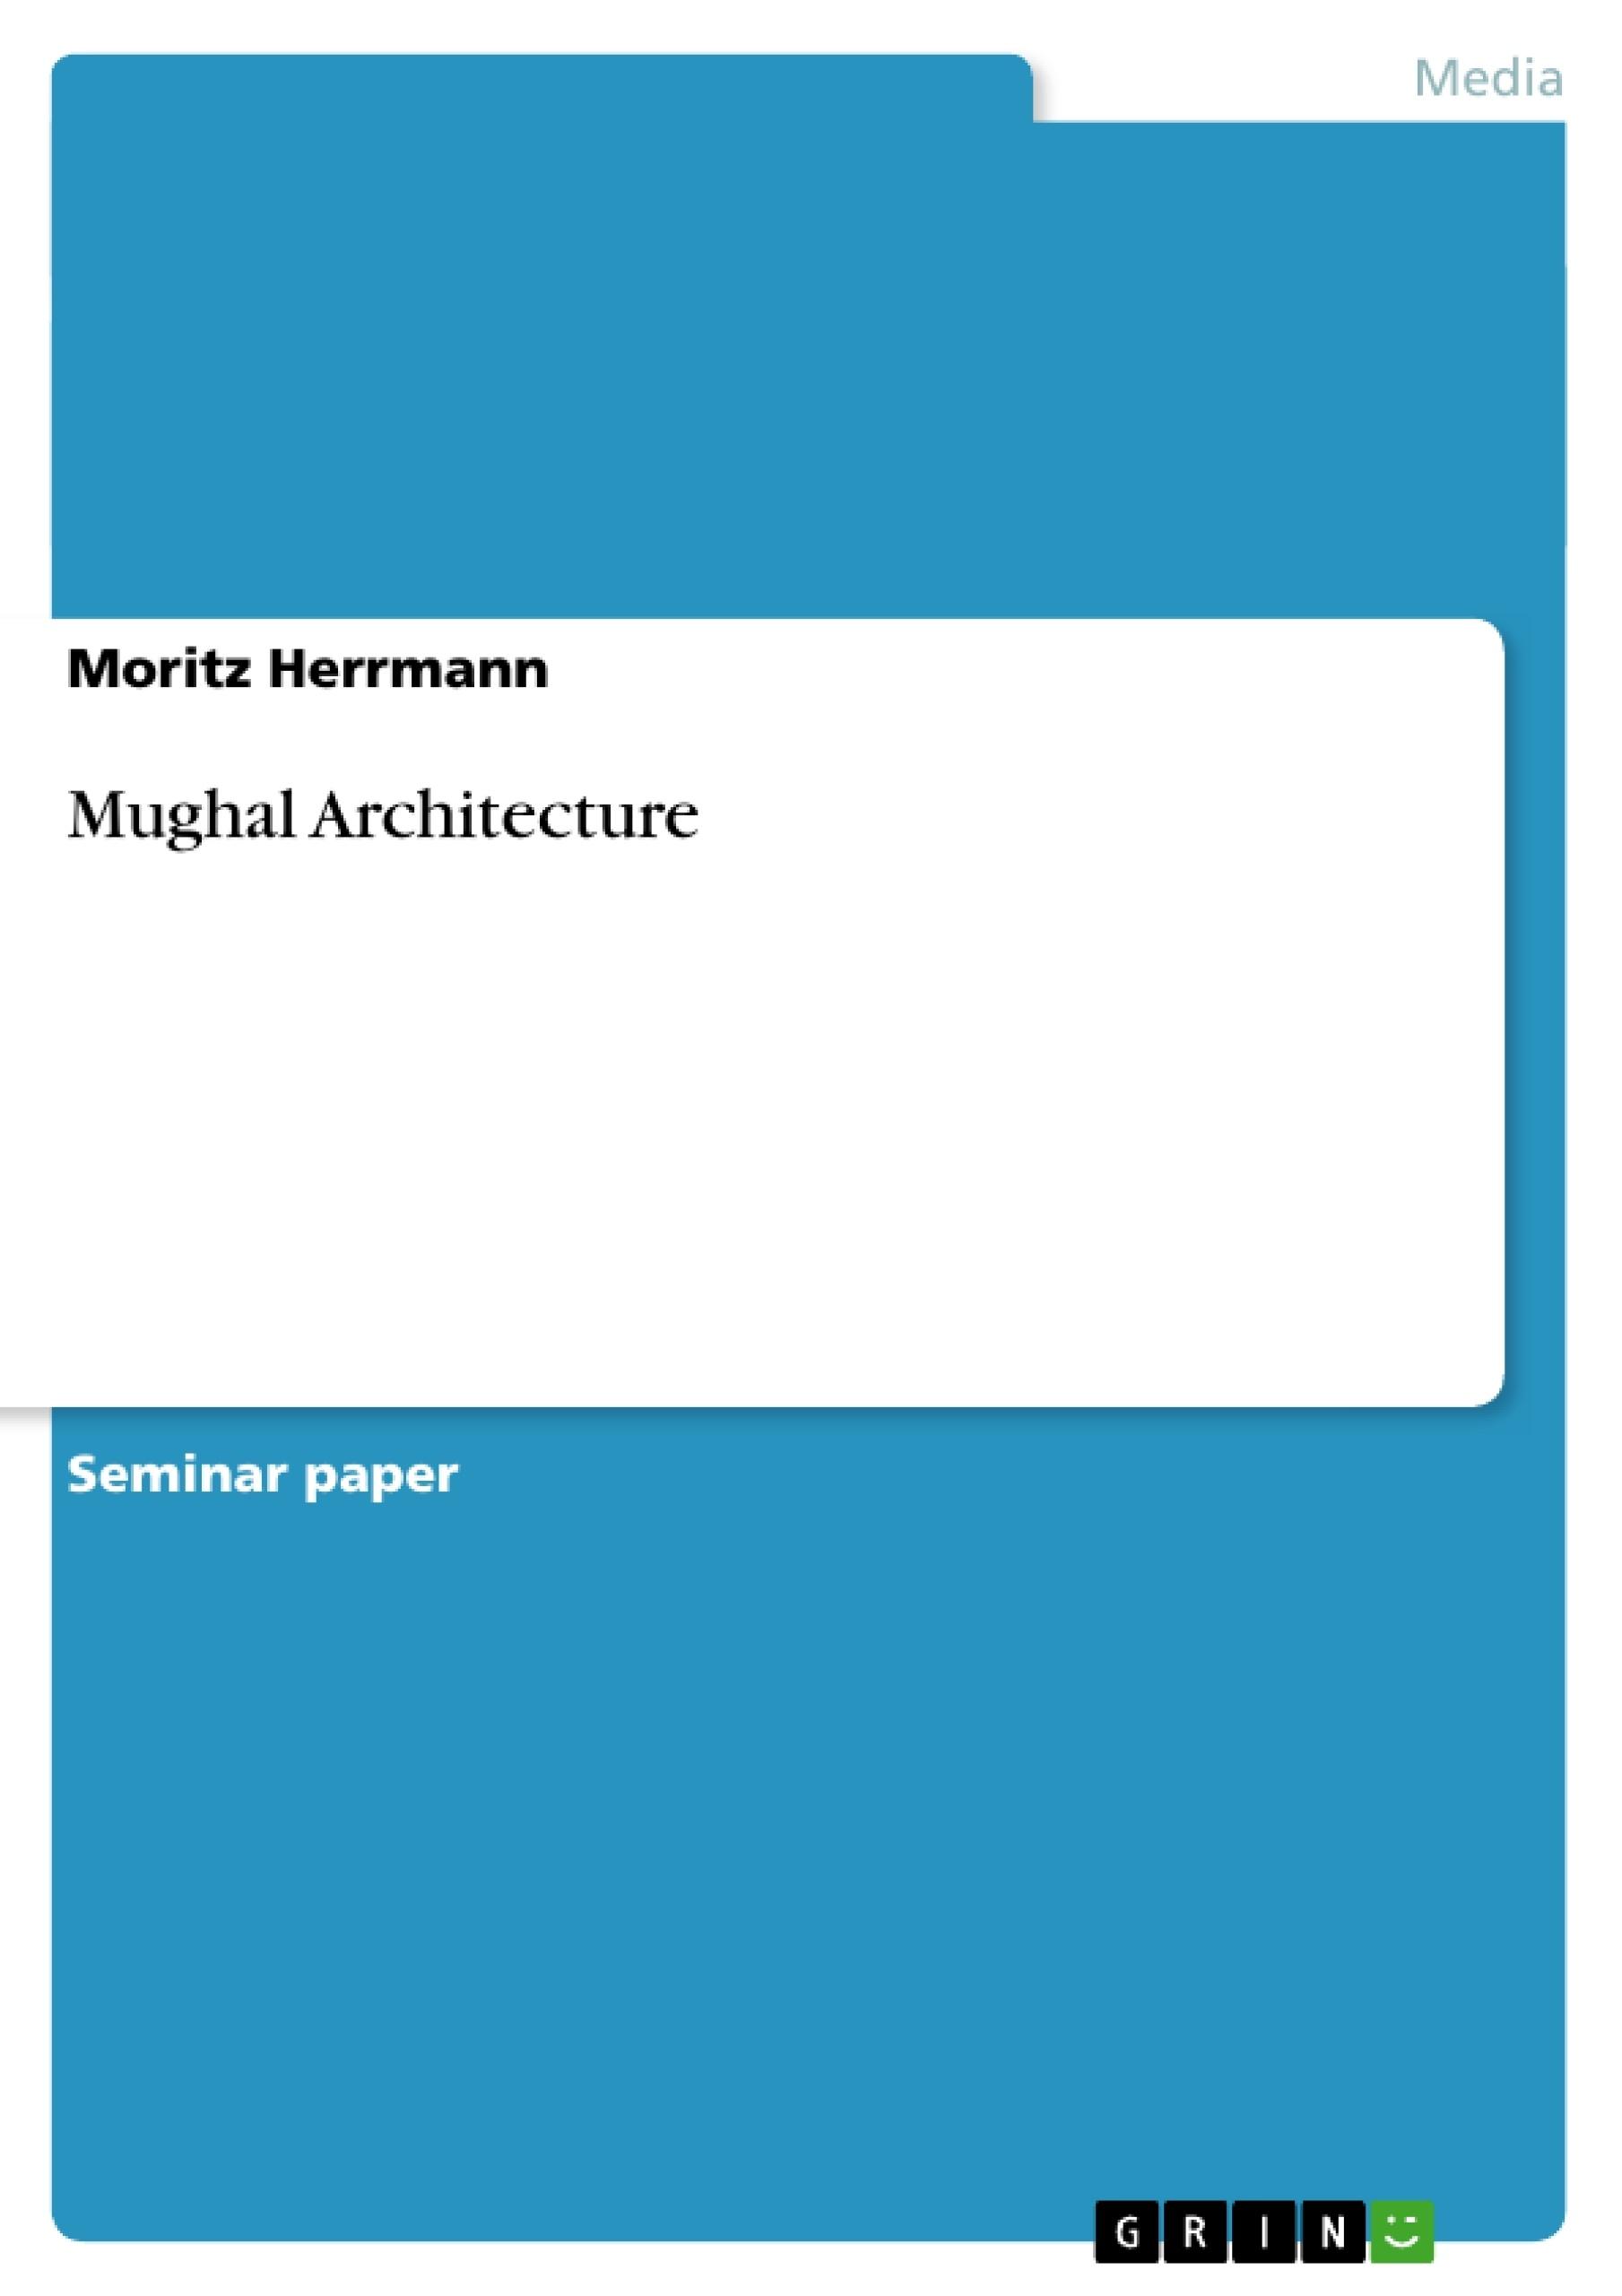 Title: Mughal Architecture